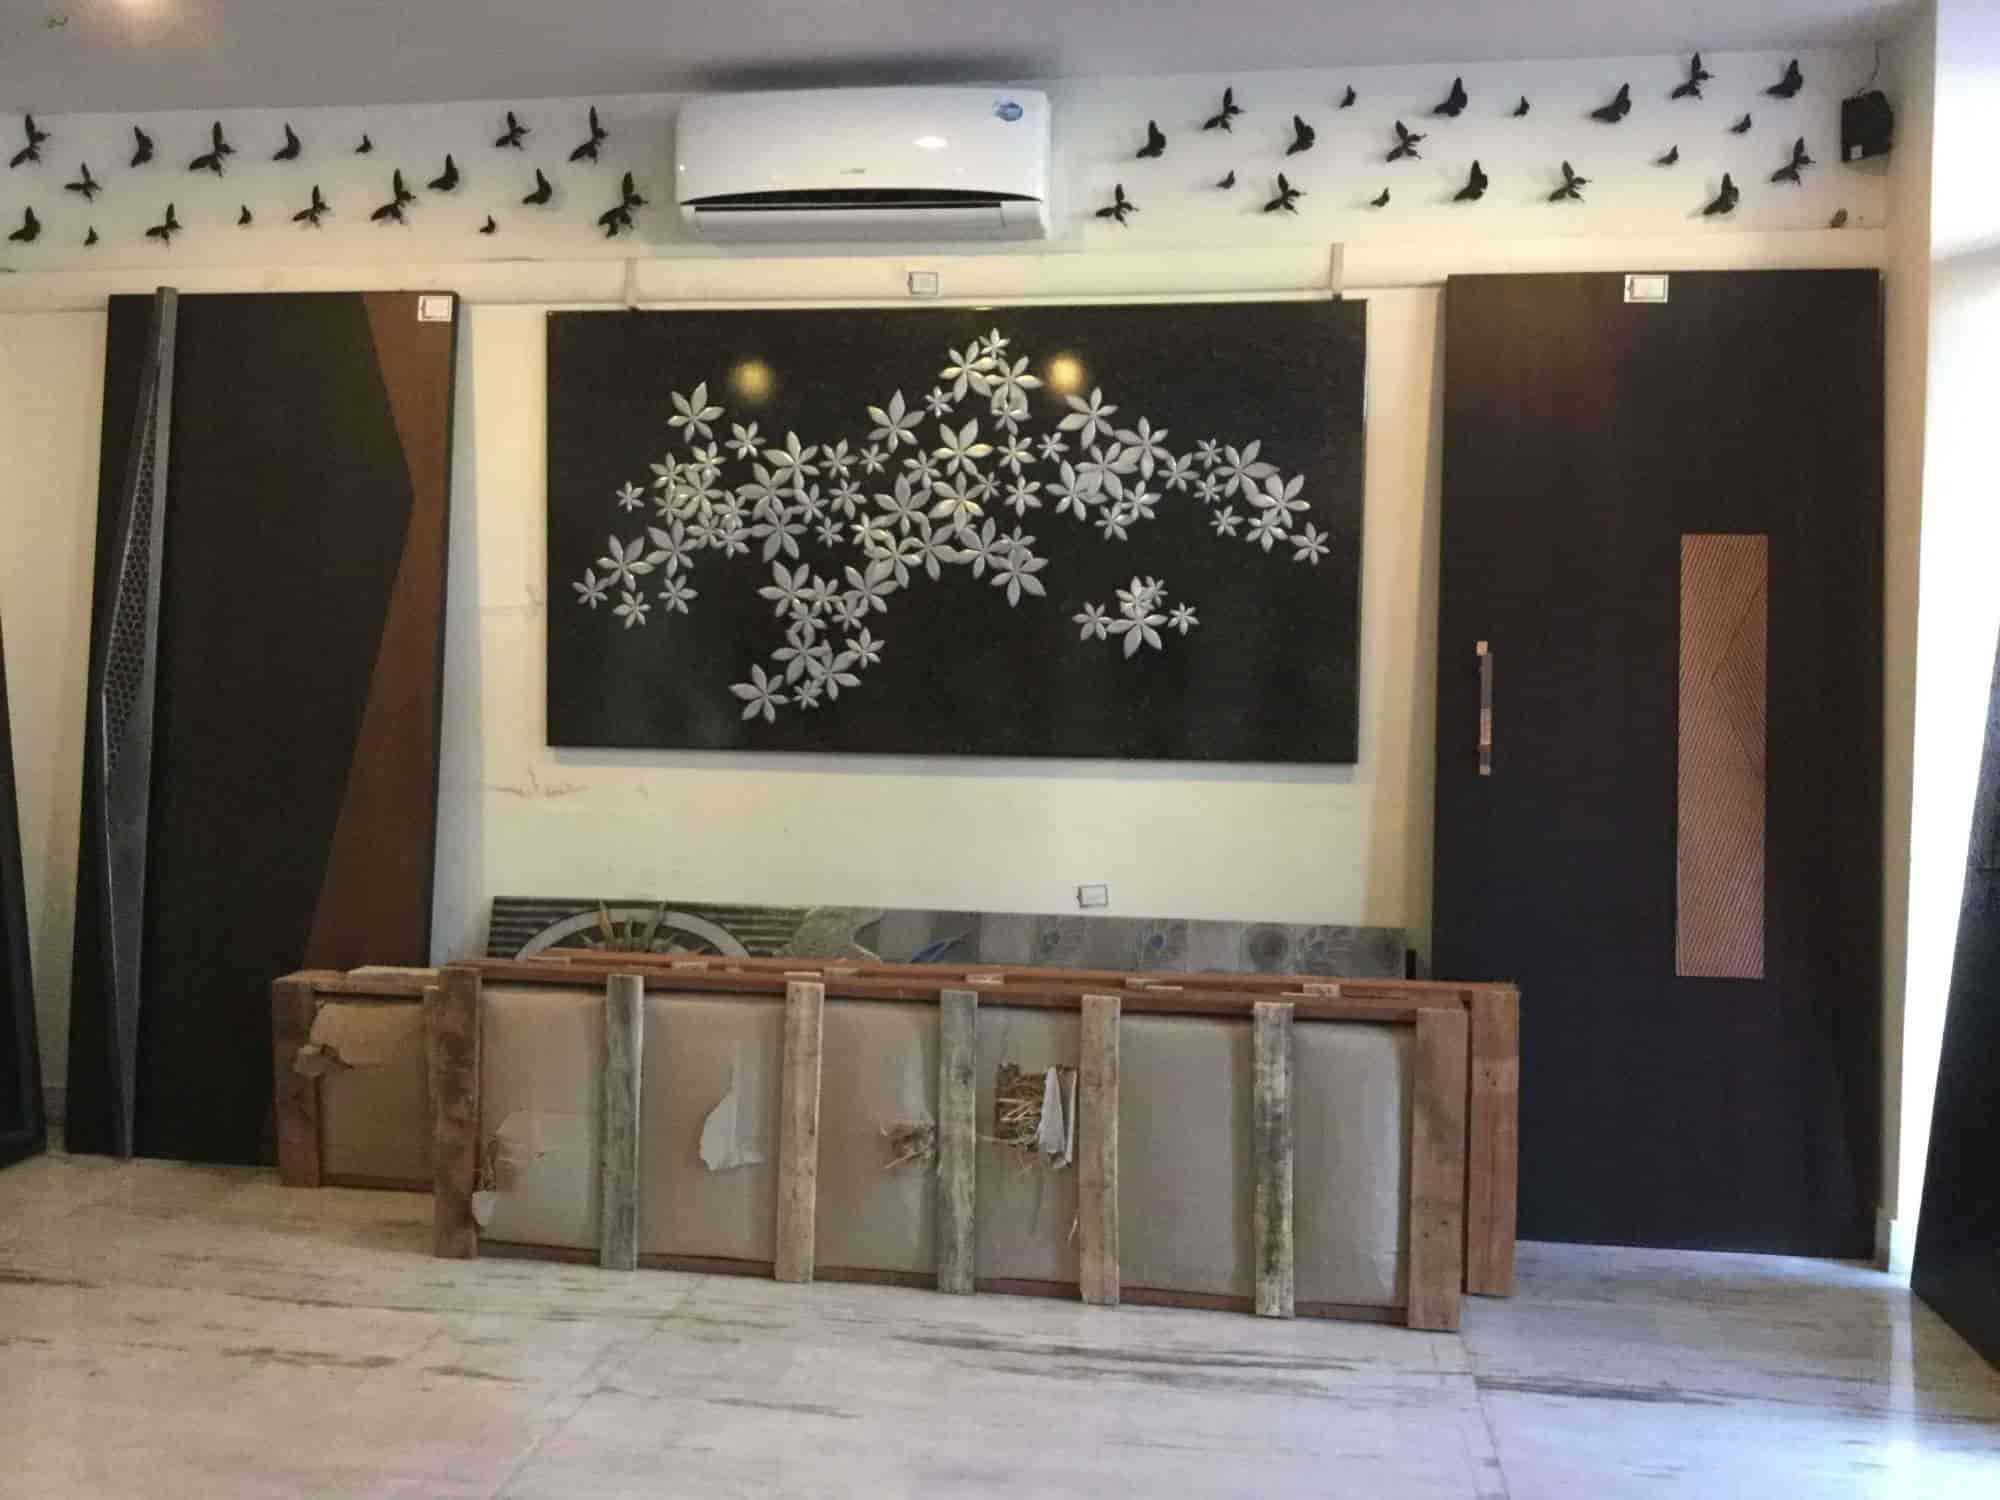 artisticks art forum pvt ltd jubilee hills hyderabad